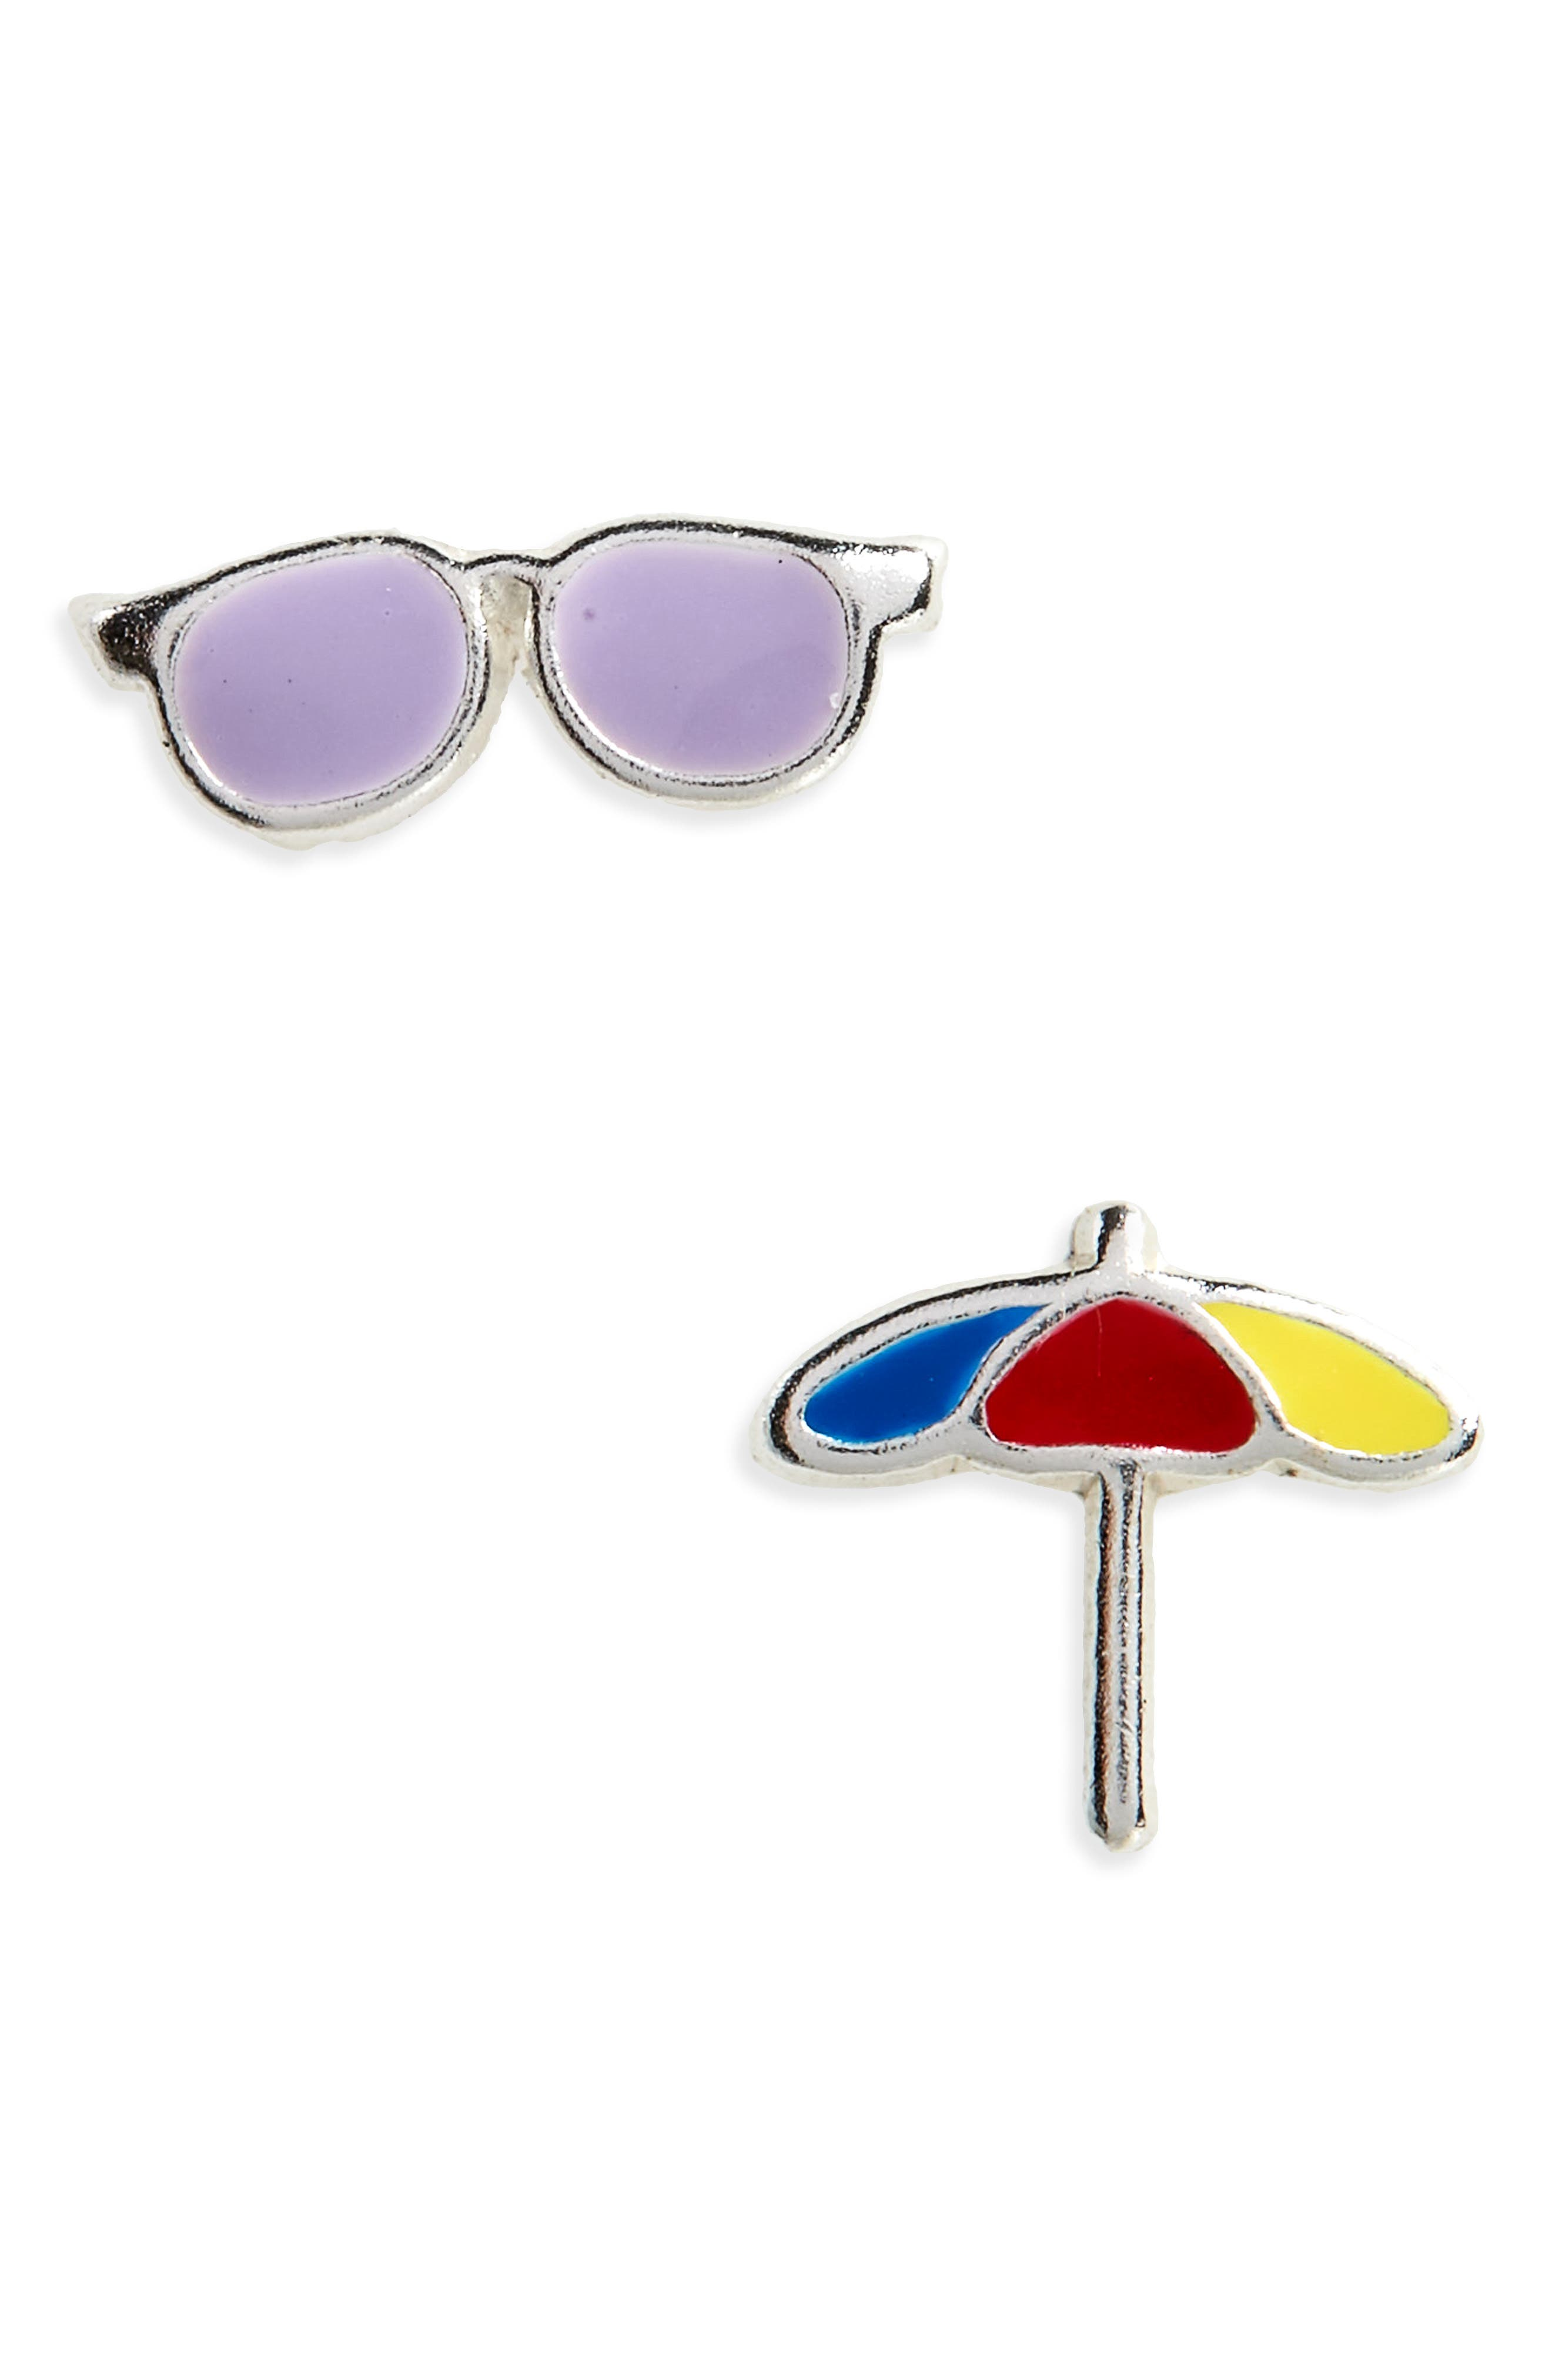 Sunglasses & Beach Umbrella Sterling Silver Stud Earrings,                             Main thumbnail 1, color,                             700